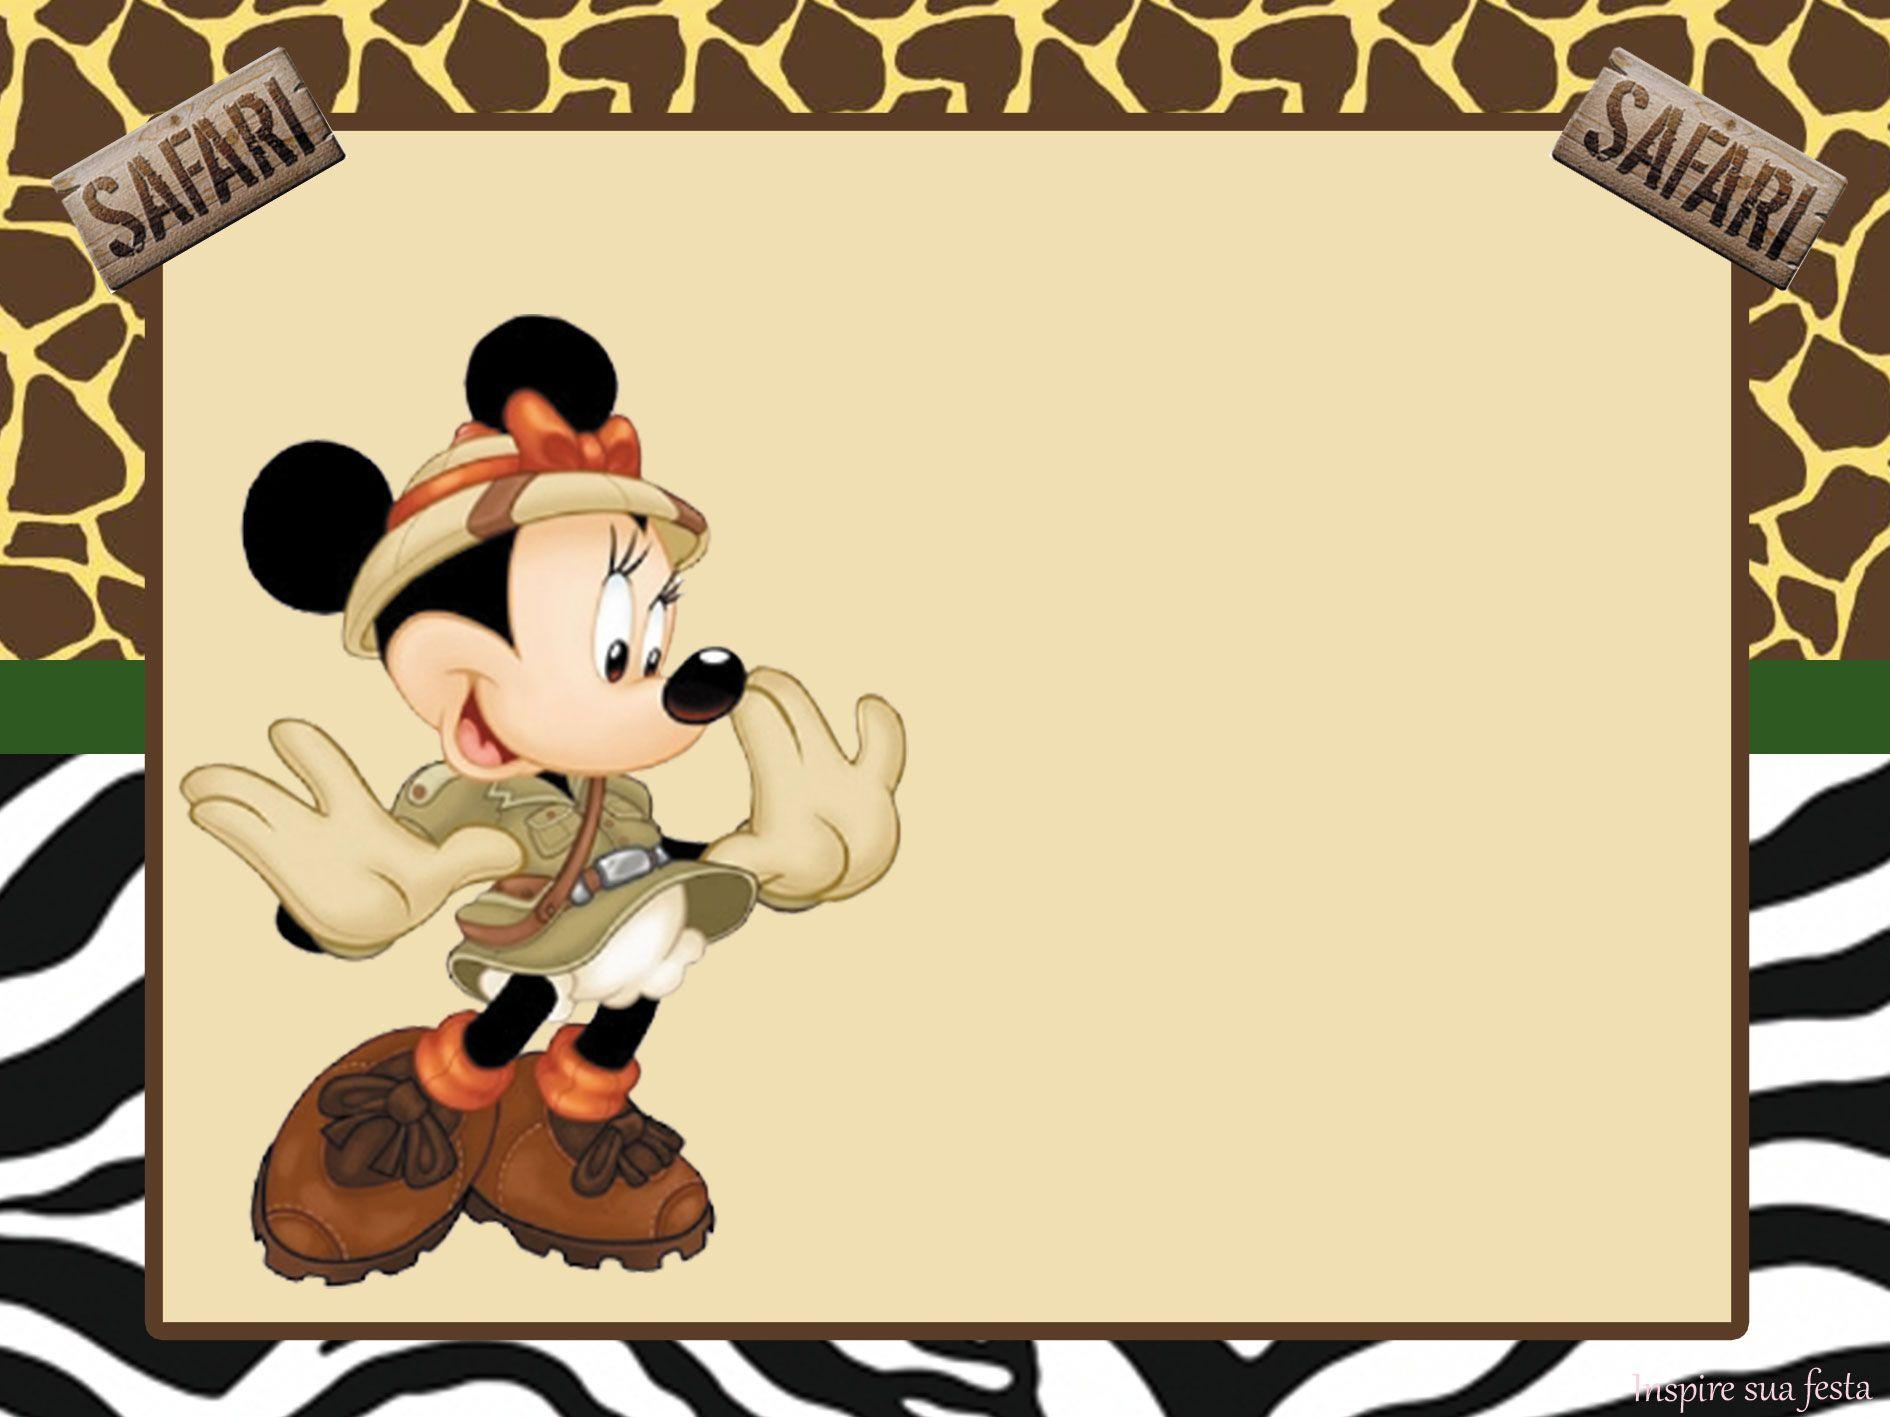 97b60efbeb9e7 Disney Printables · http   inspiresuafesta.com mickey-e-minnie-safari-